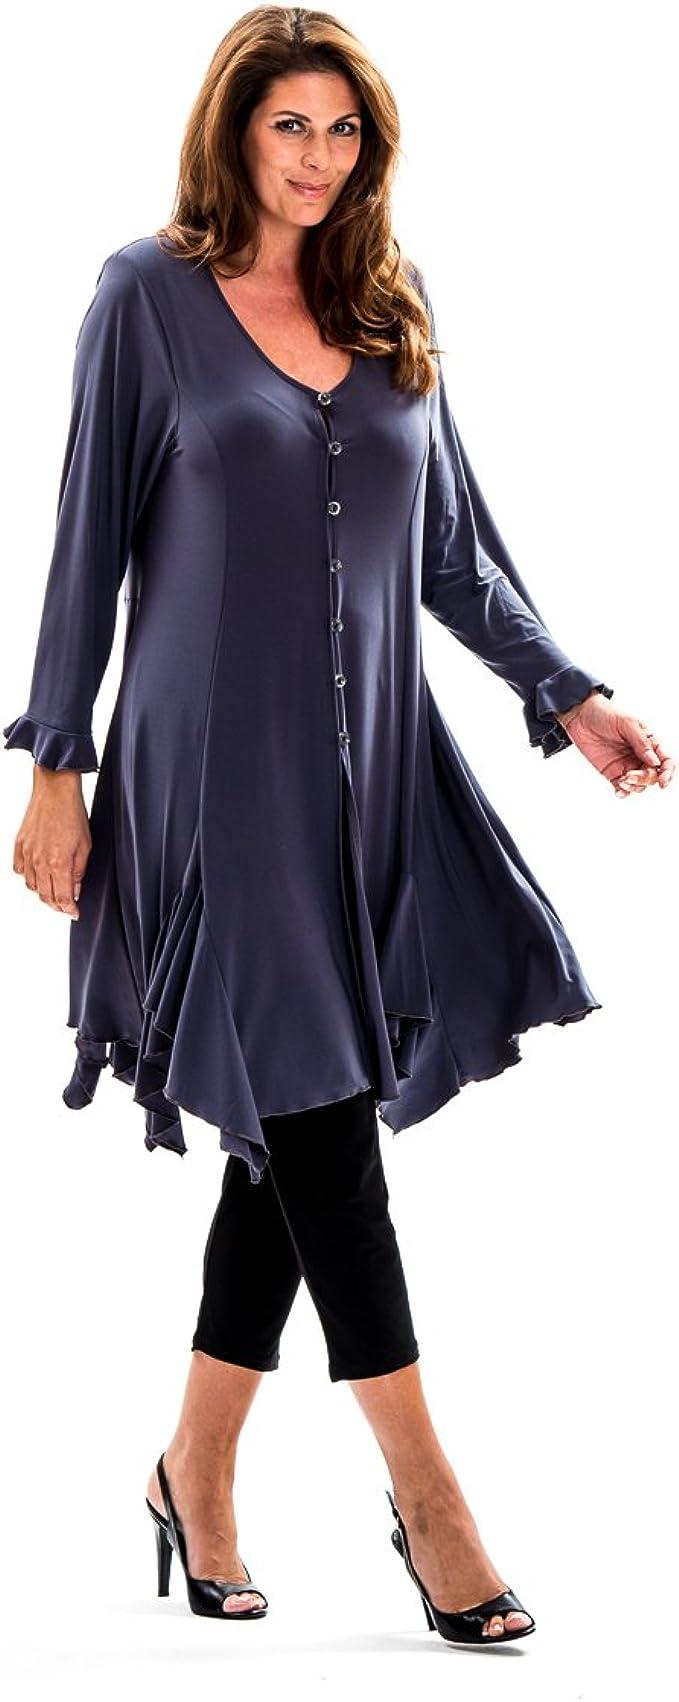 NEU Übergröße schickes Damen Stretch Long Zipfel Shirt 3//4 Arm lila Gr.56,60